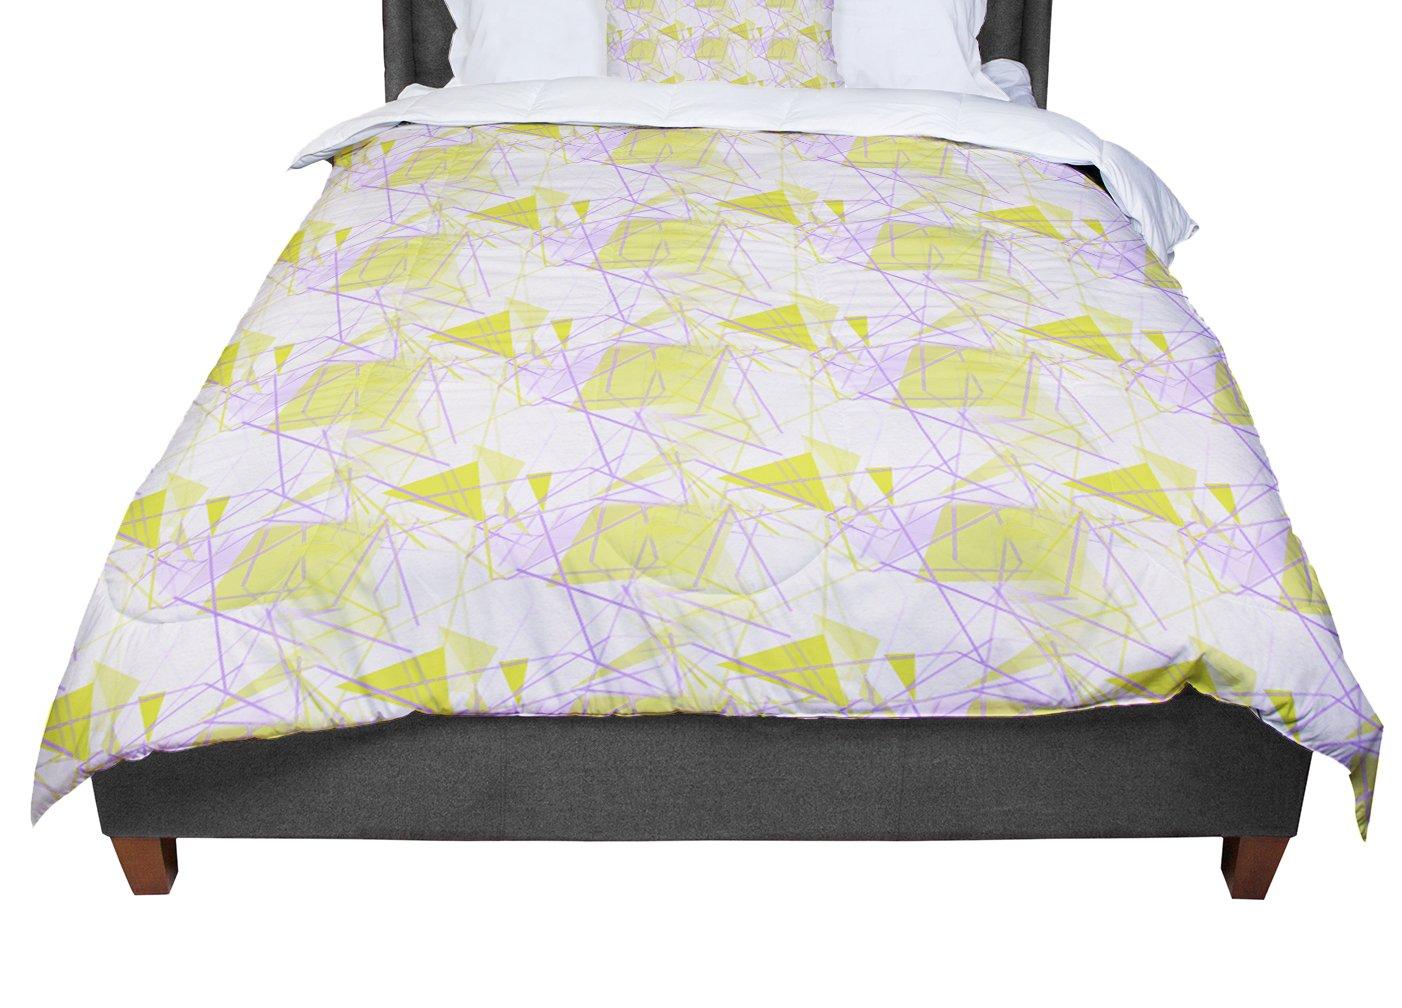 Cal King Comforter 104 X 88 KESS InHouse Alison Coxon Yellow King